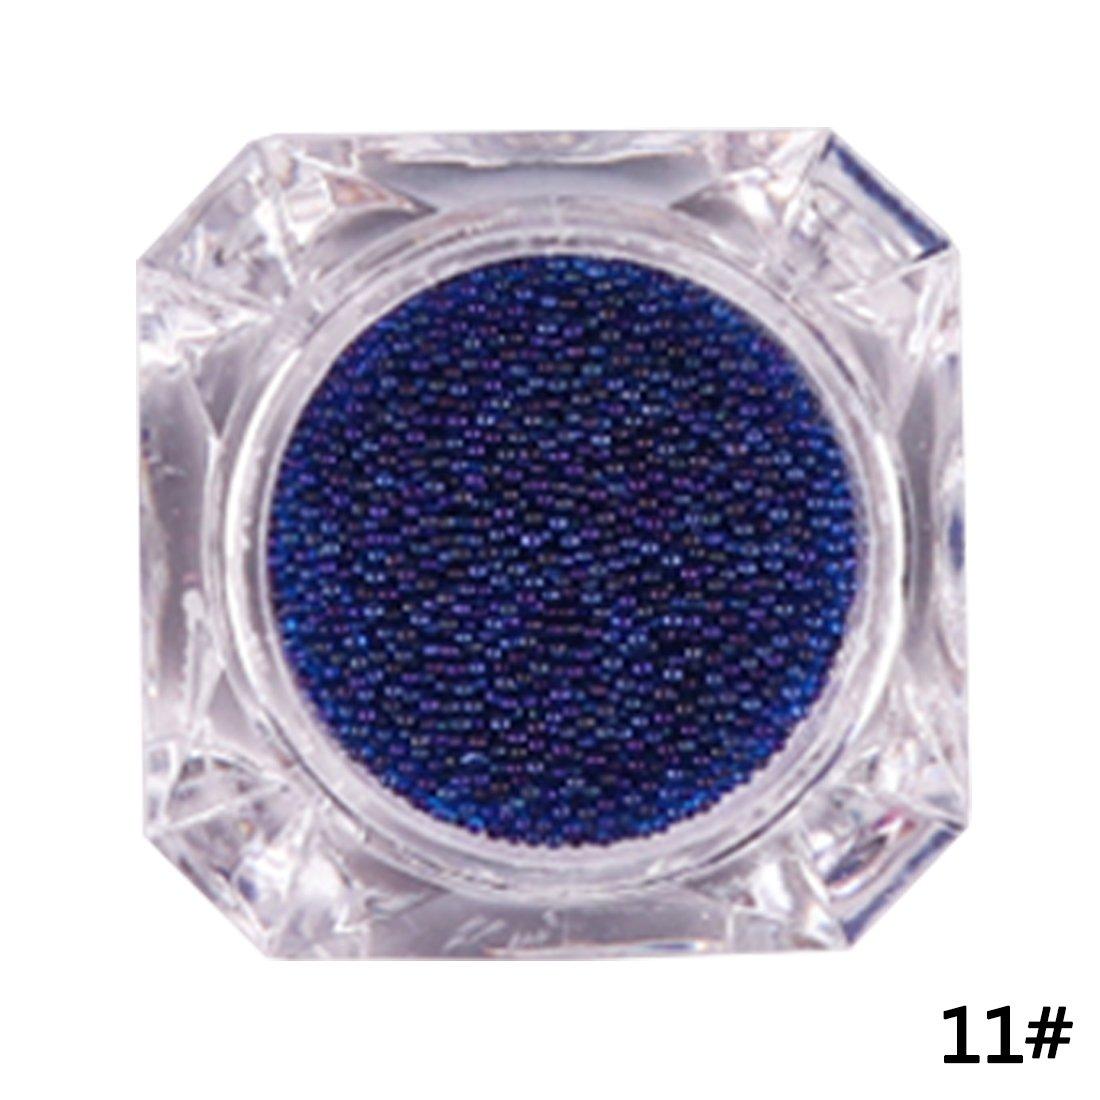 Consejos para uñas de vidrio de cristal Manicure Decoration 3D Pixie Nail Glitter Nail-1 ChenYao-Swansea